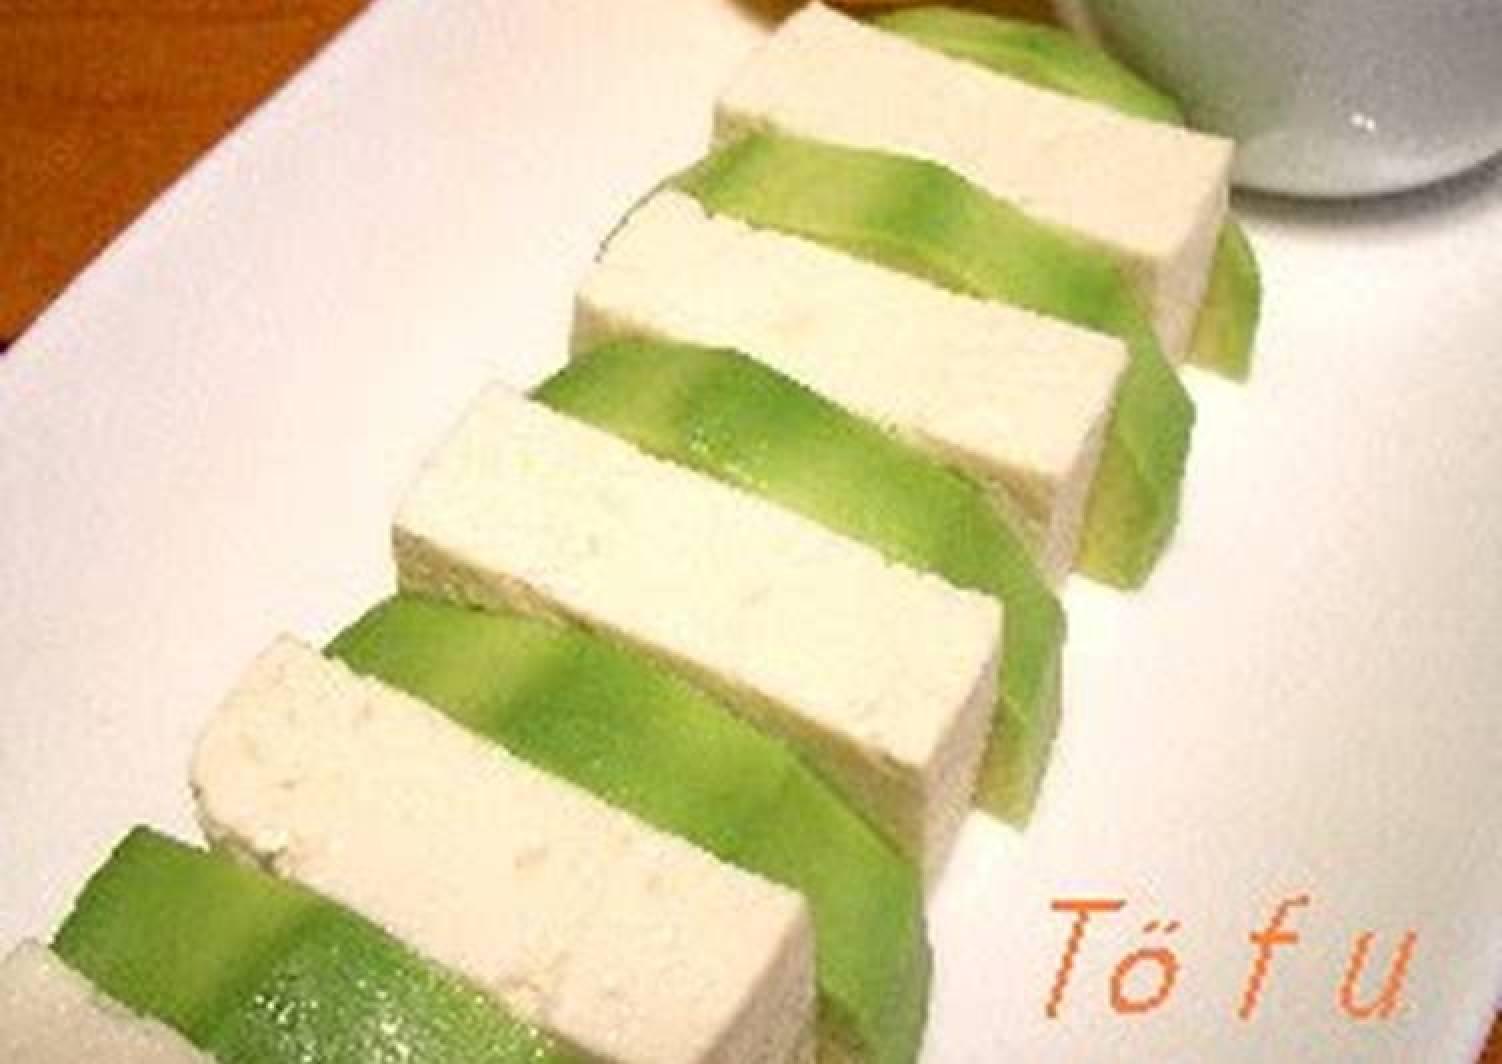 Tofu and Avocado Salad